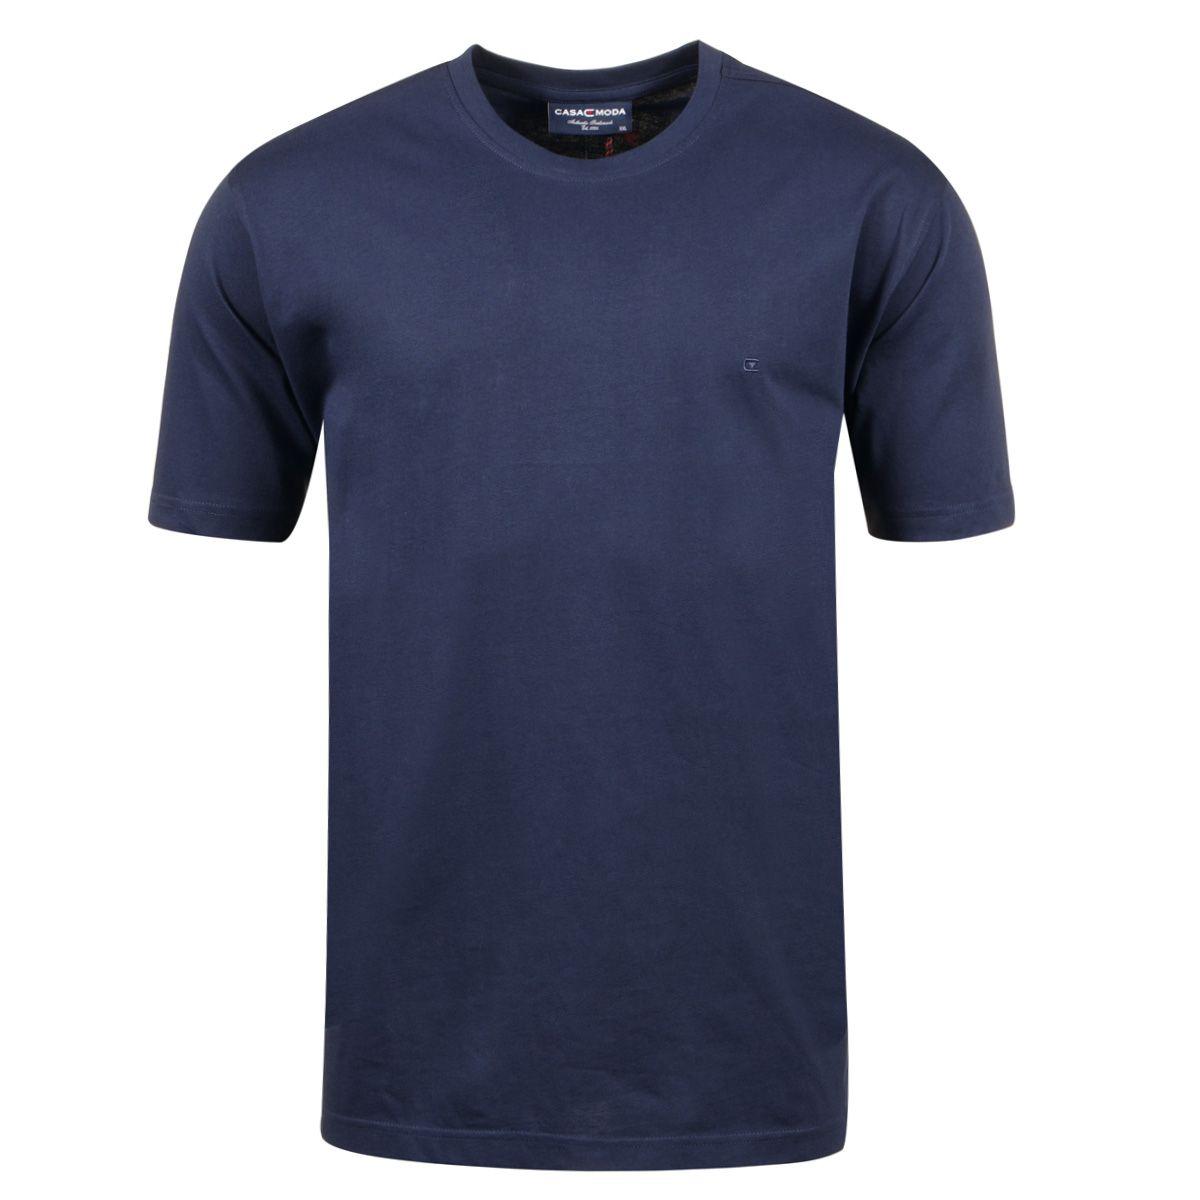 t shirt bleu grande taille du 2xl au 6xl size factory casa moda. Black Bedroom Furniture Sets. Home Design Ideas